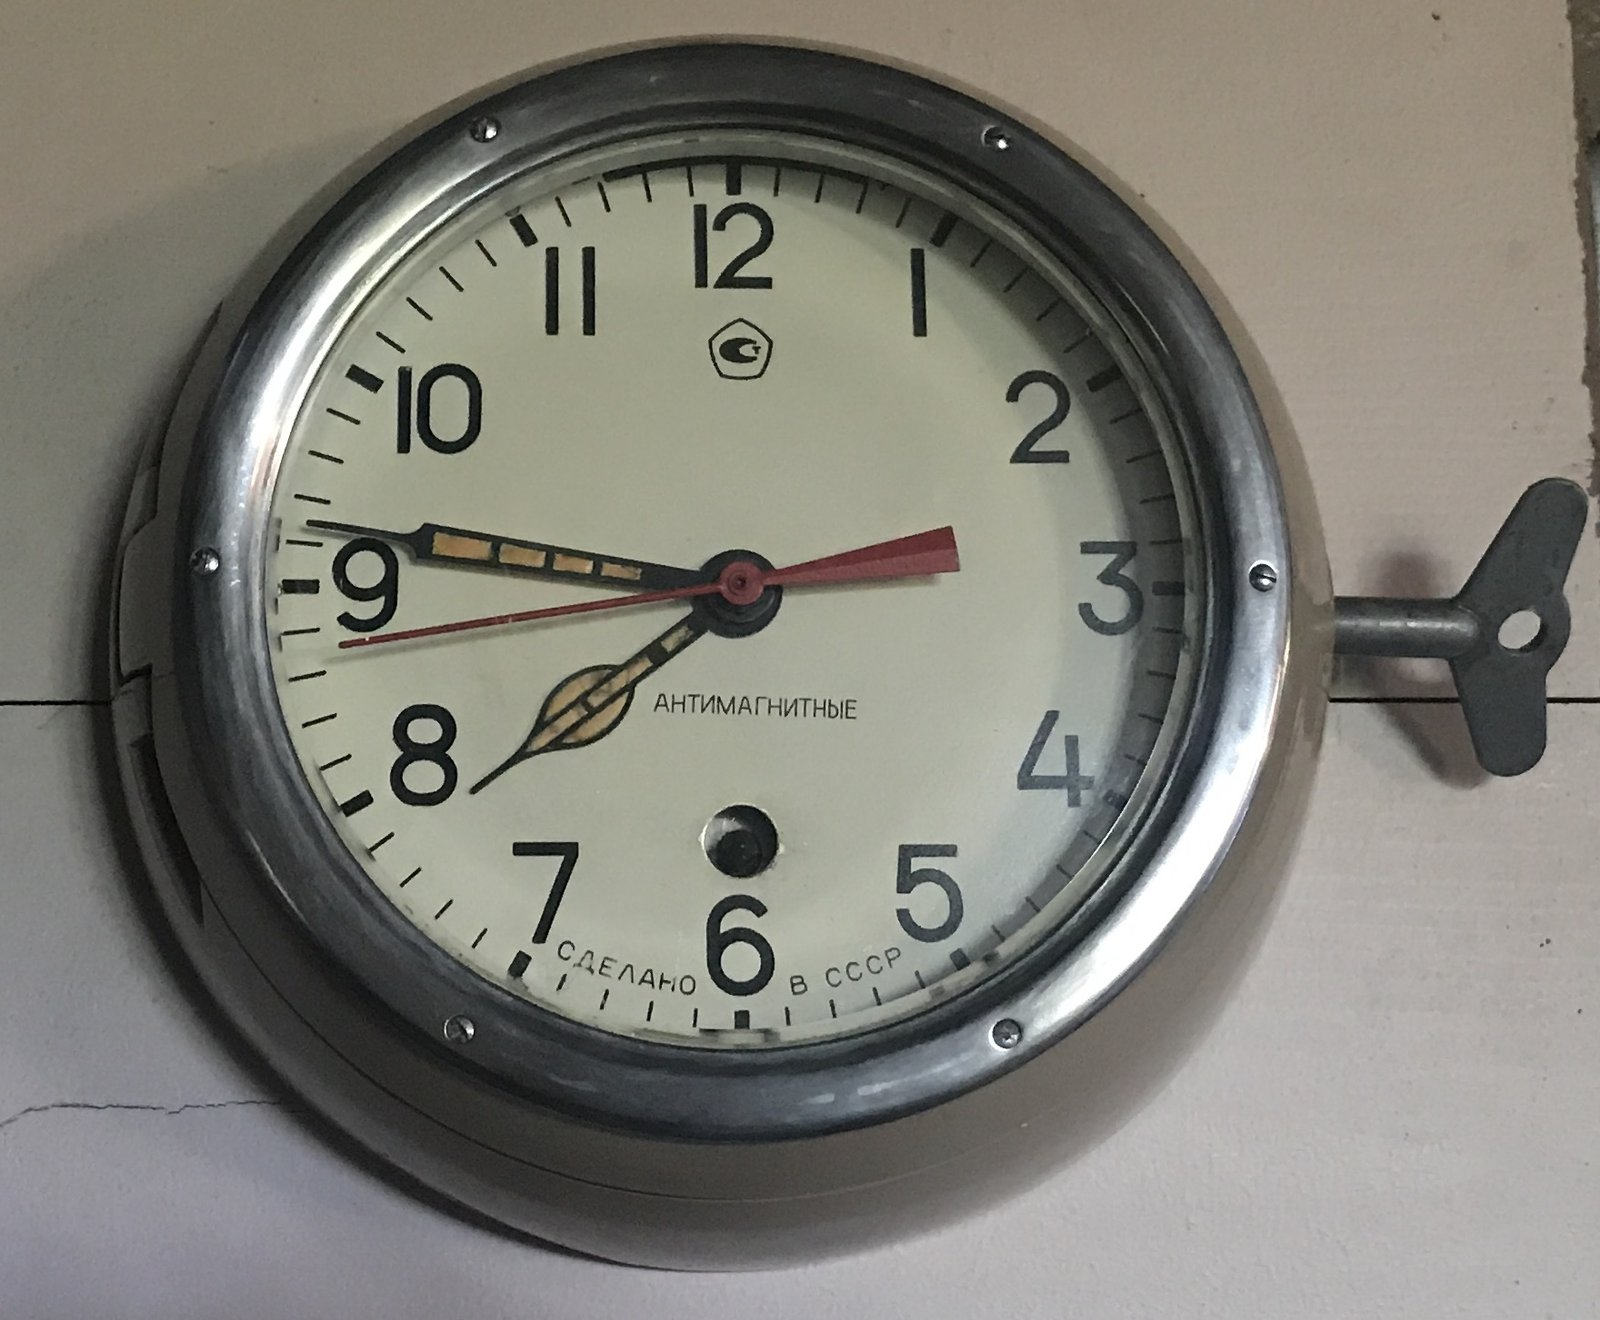 Horloge de marine Vostok - Page 2 210530080037172724